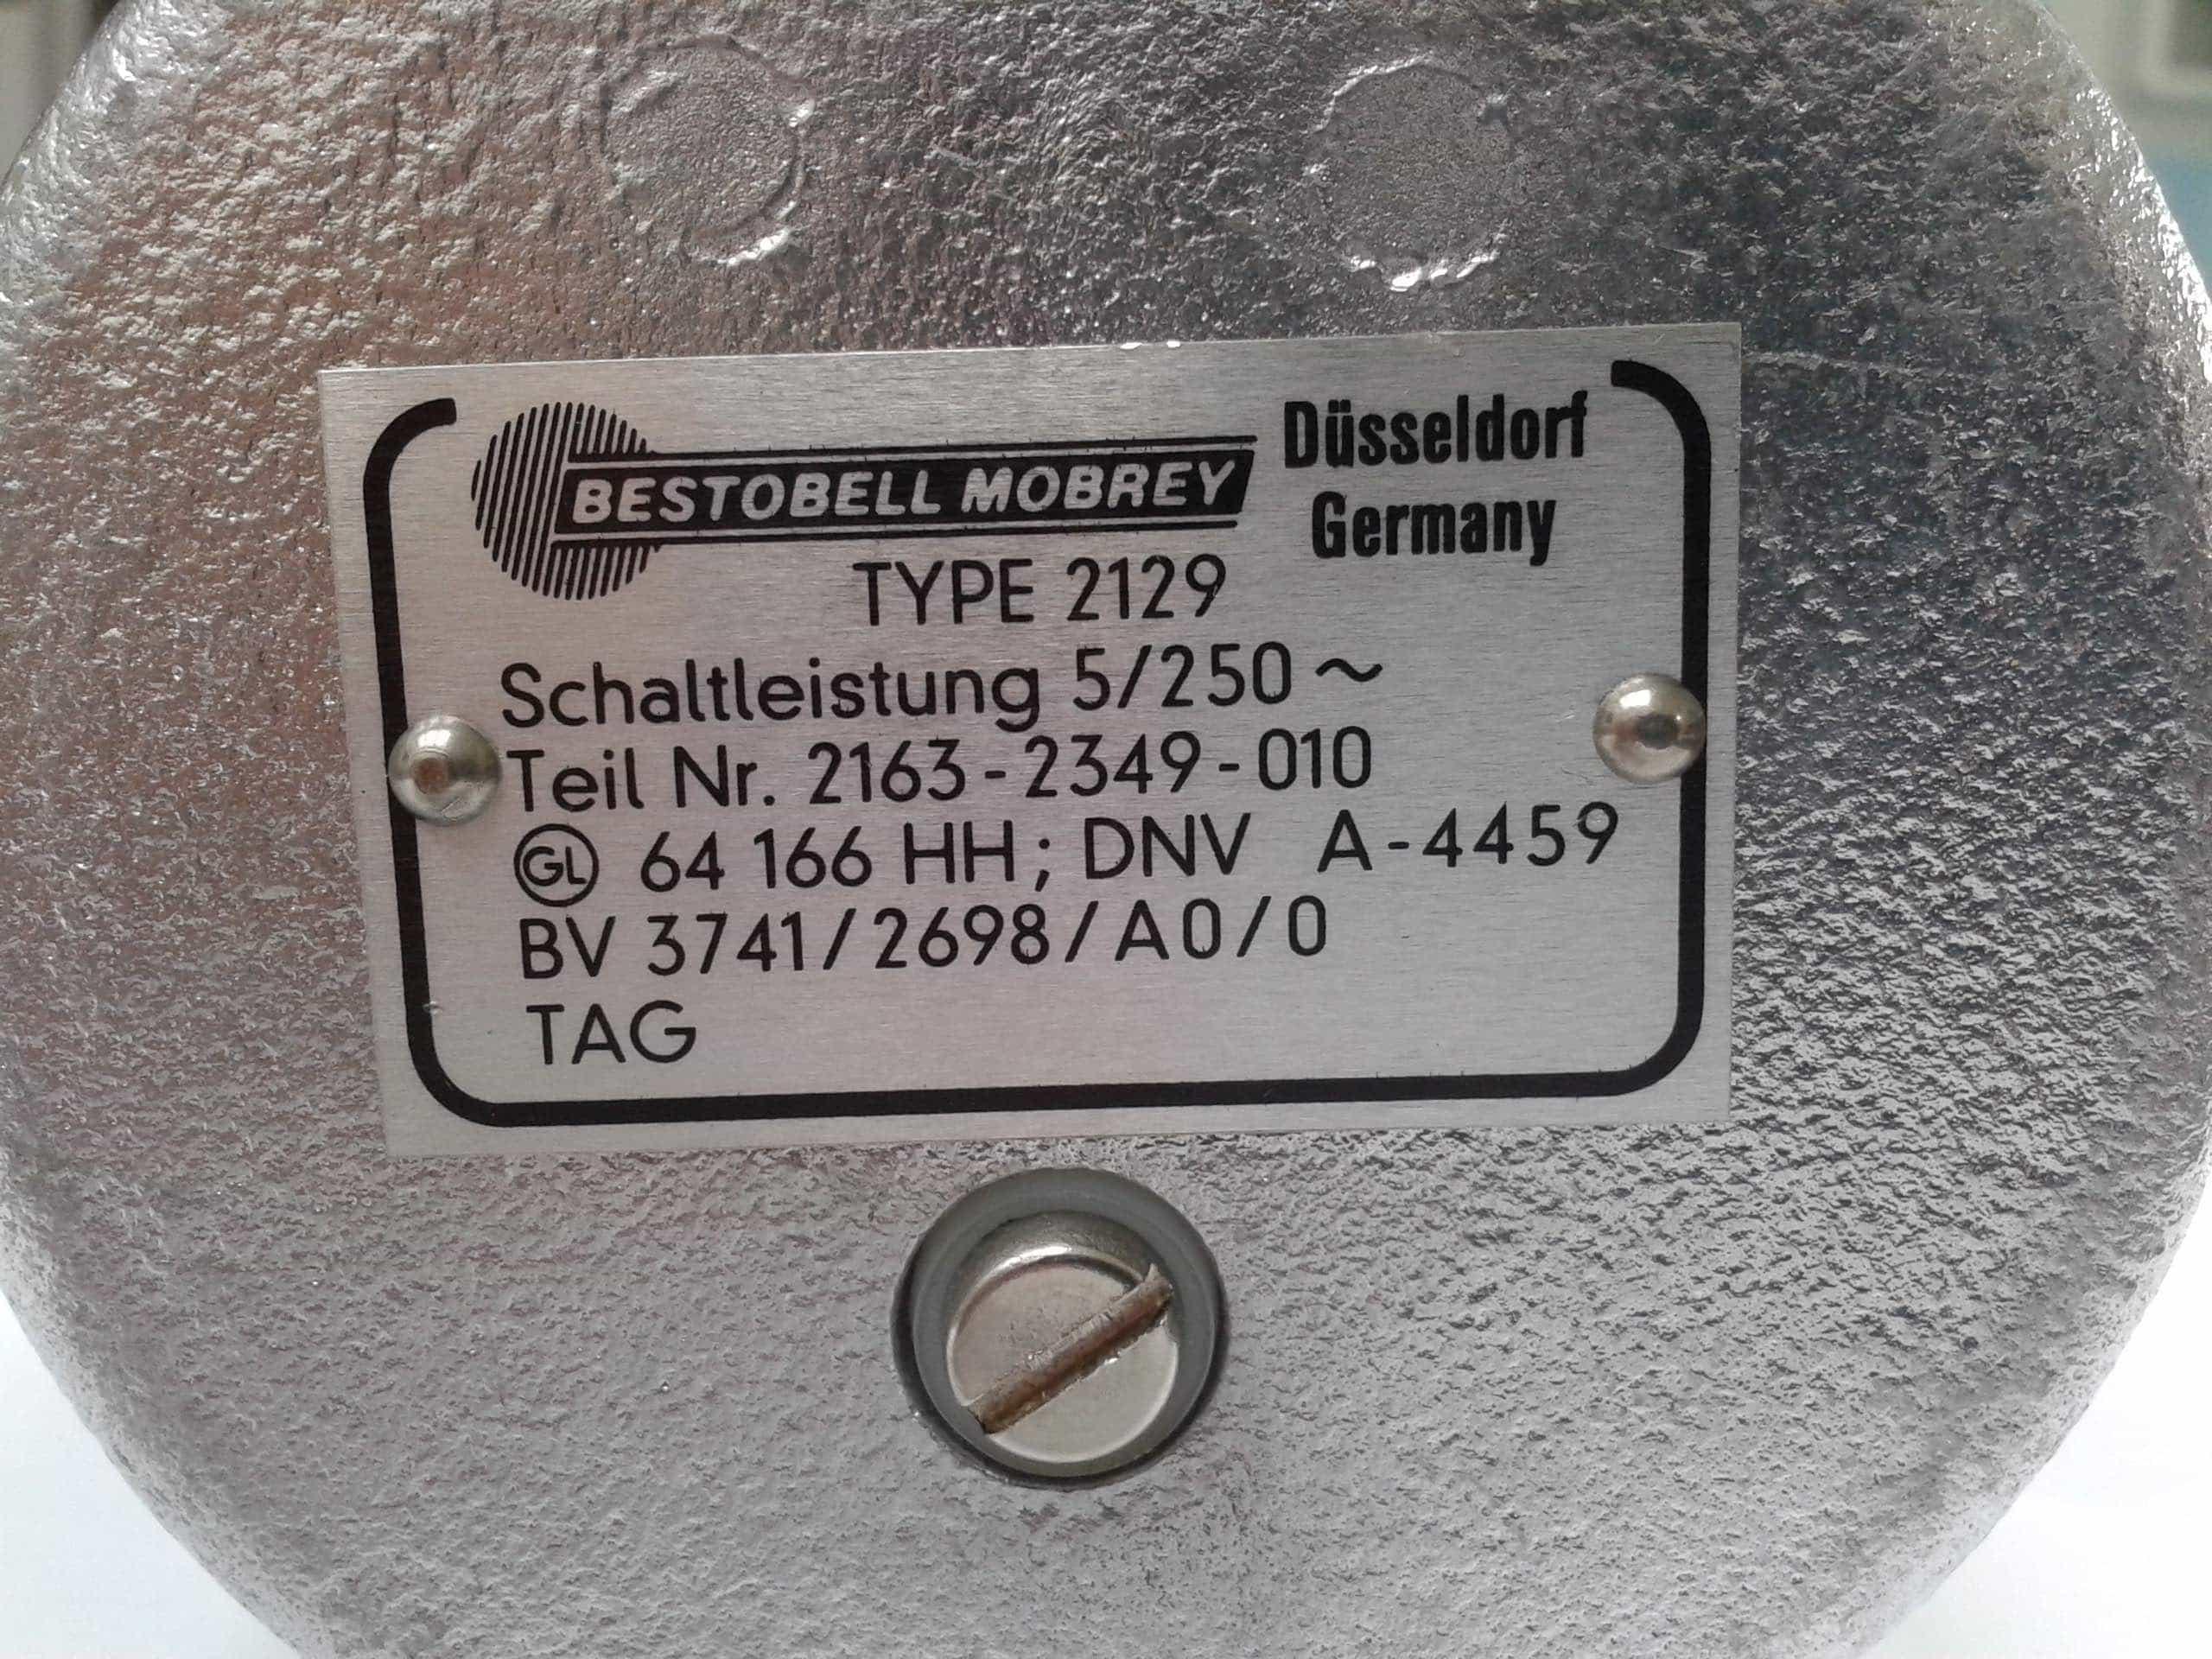 Bestobell Mobrey 2129 Level Switch